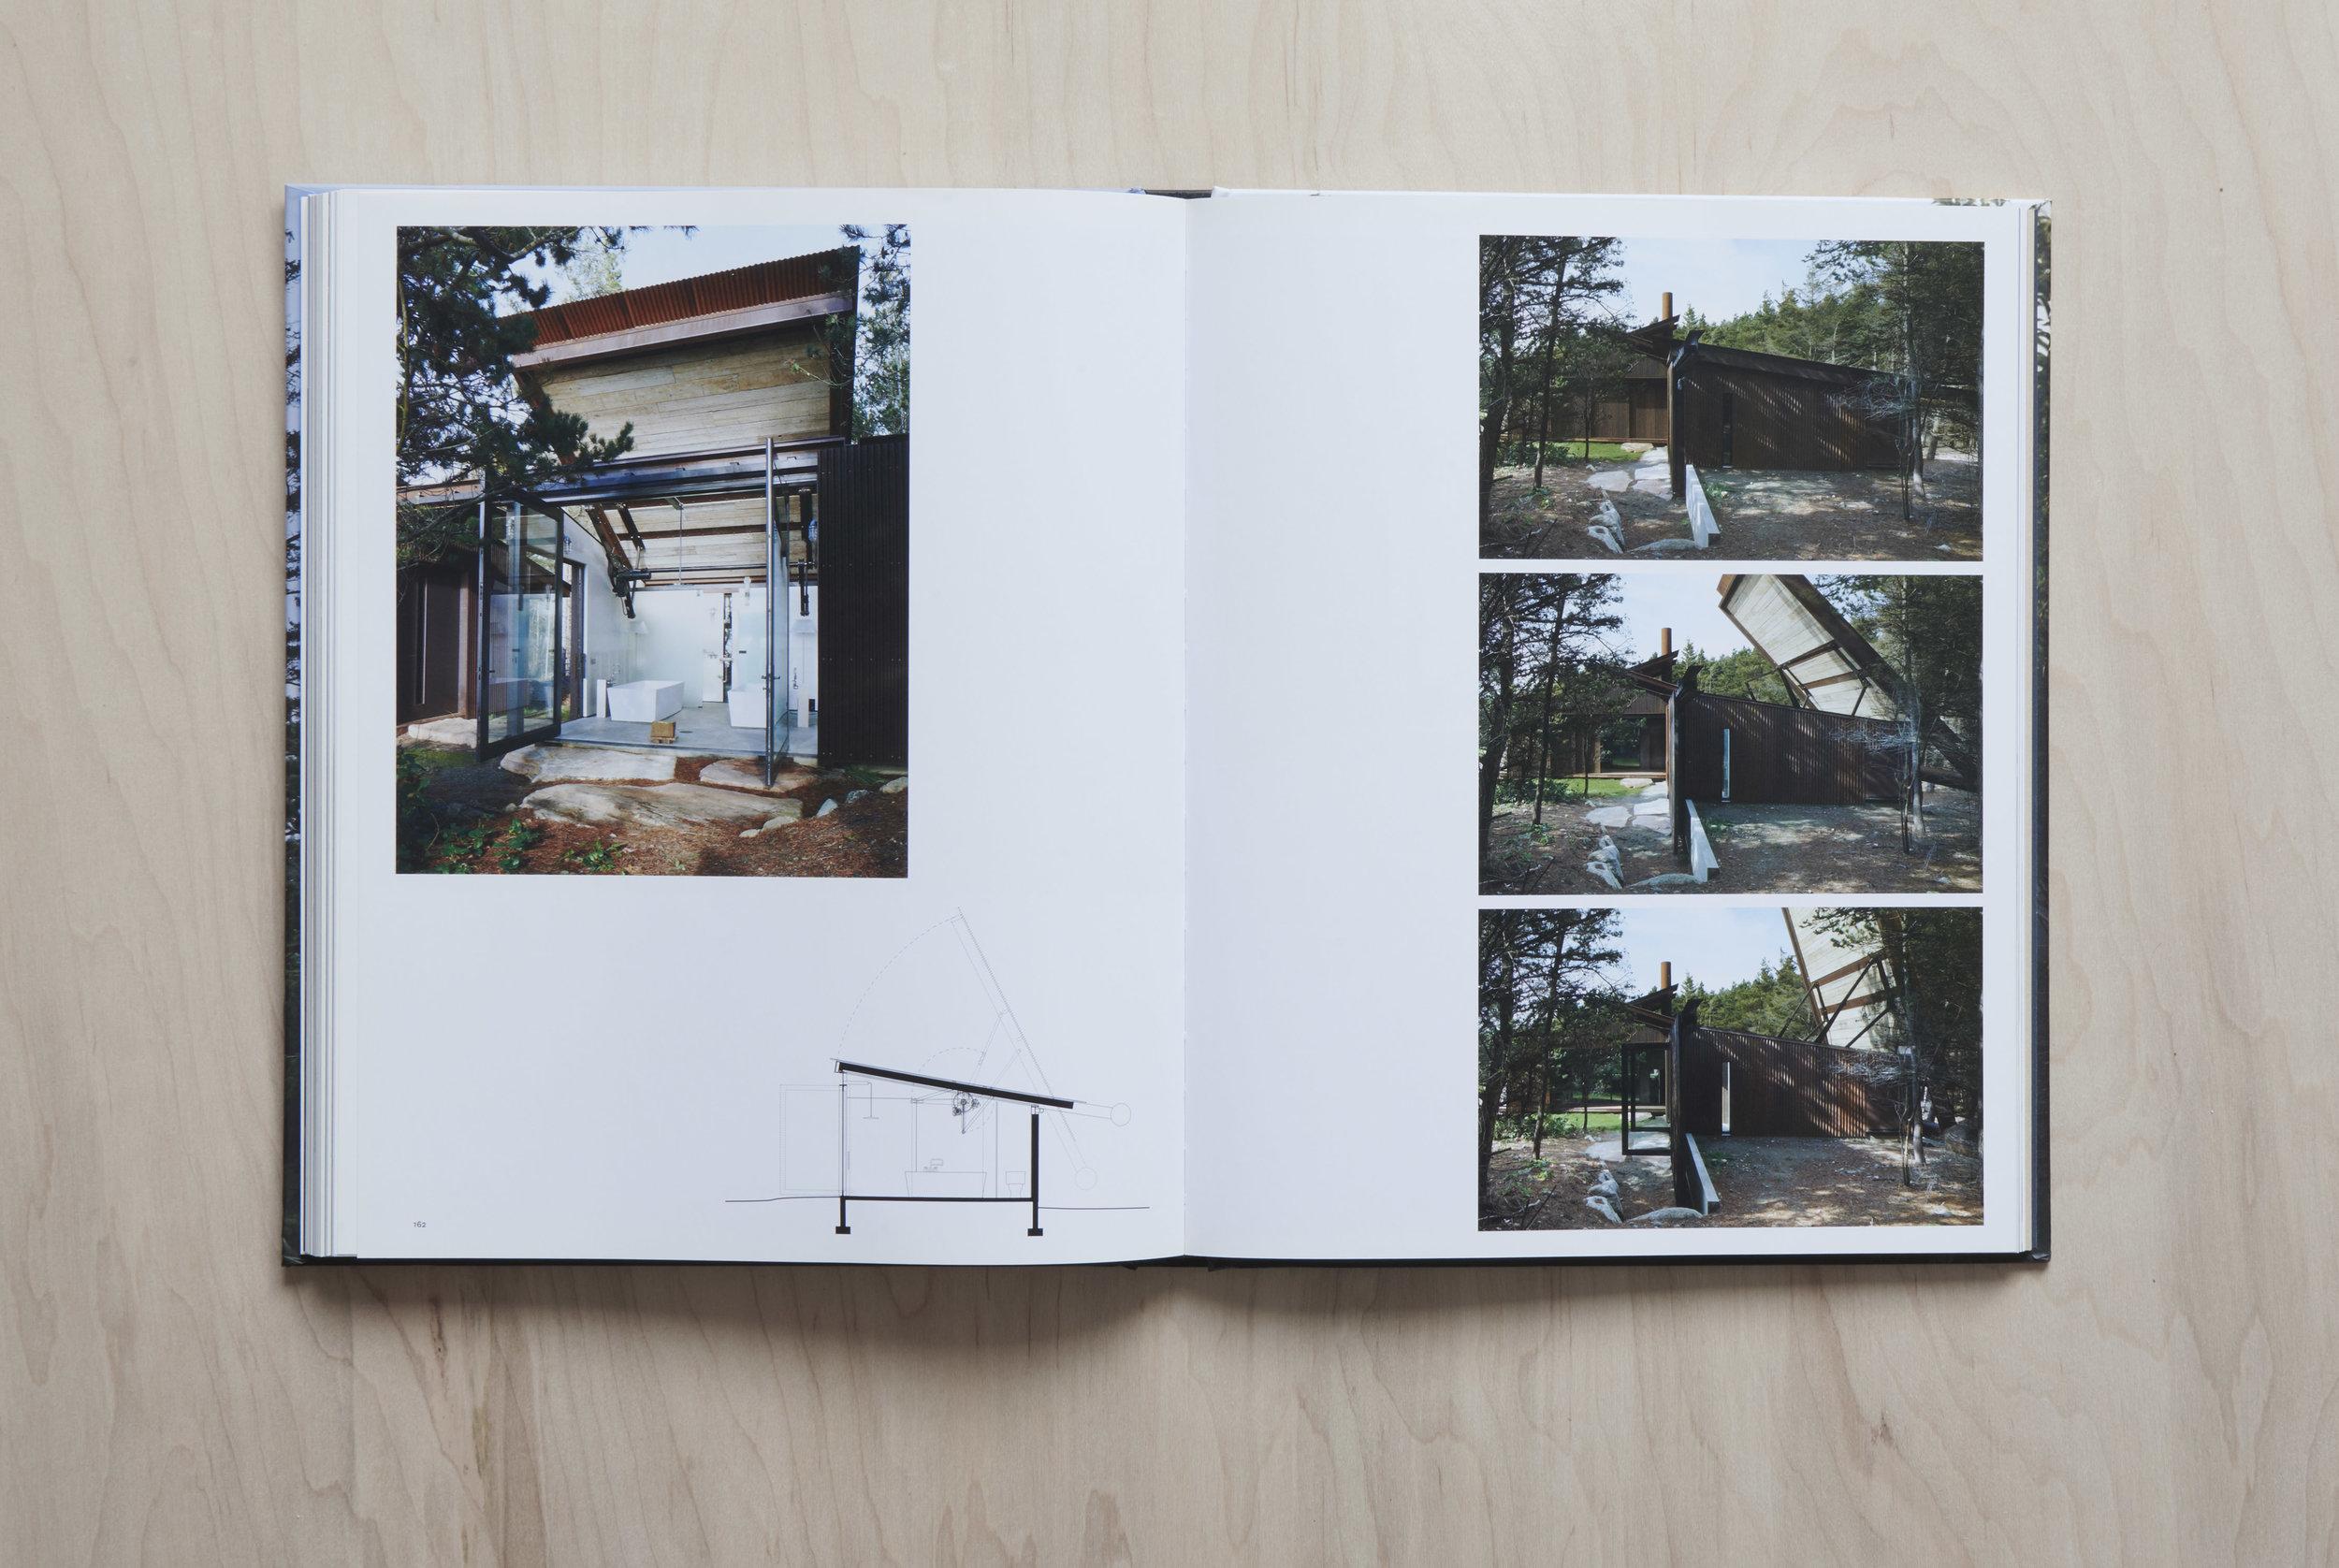 2019_03_04_bookproject_0439.jpg